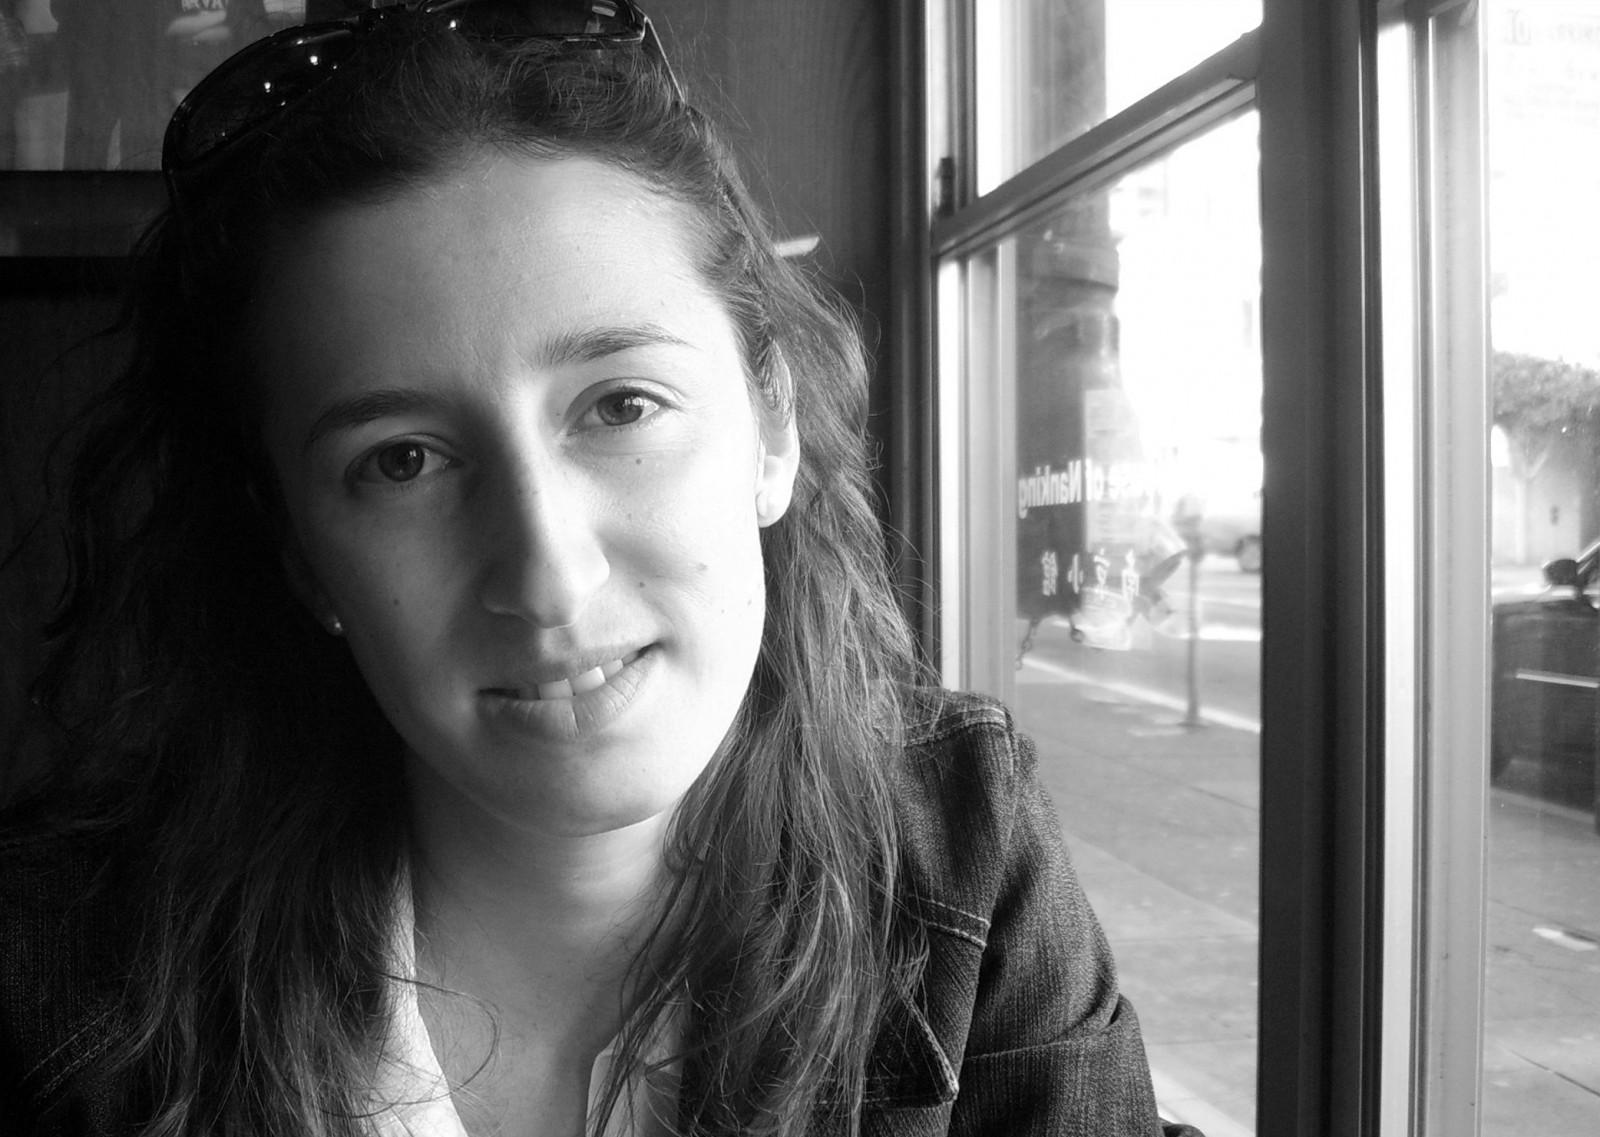 PAS Nantes 2010 - Cristiane Oliveira (Brésil) - Réalisatrice - WOMAN OF THE FATHER